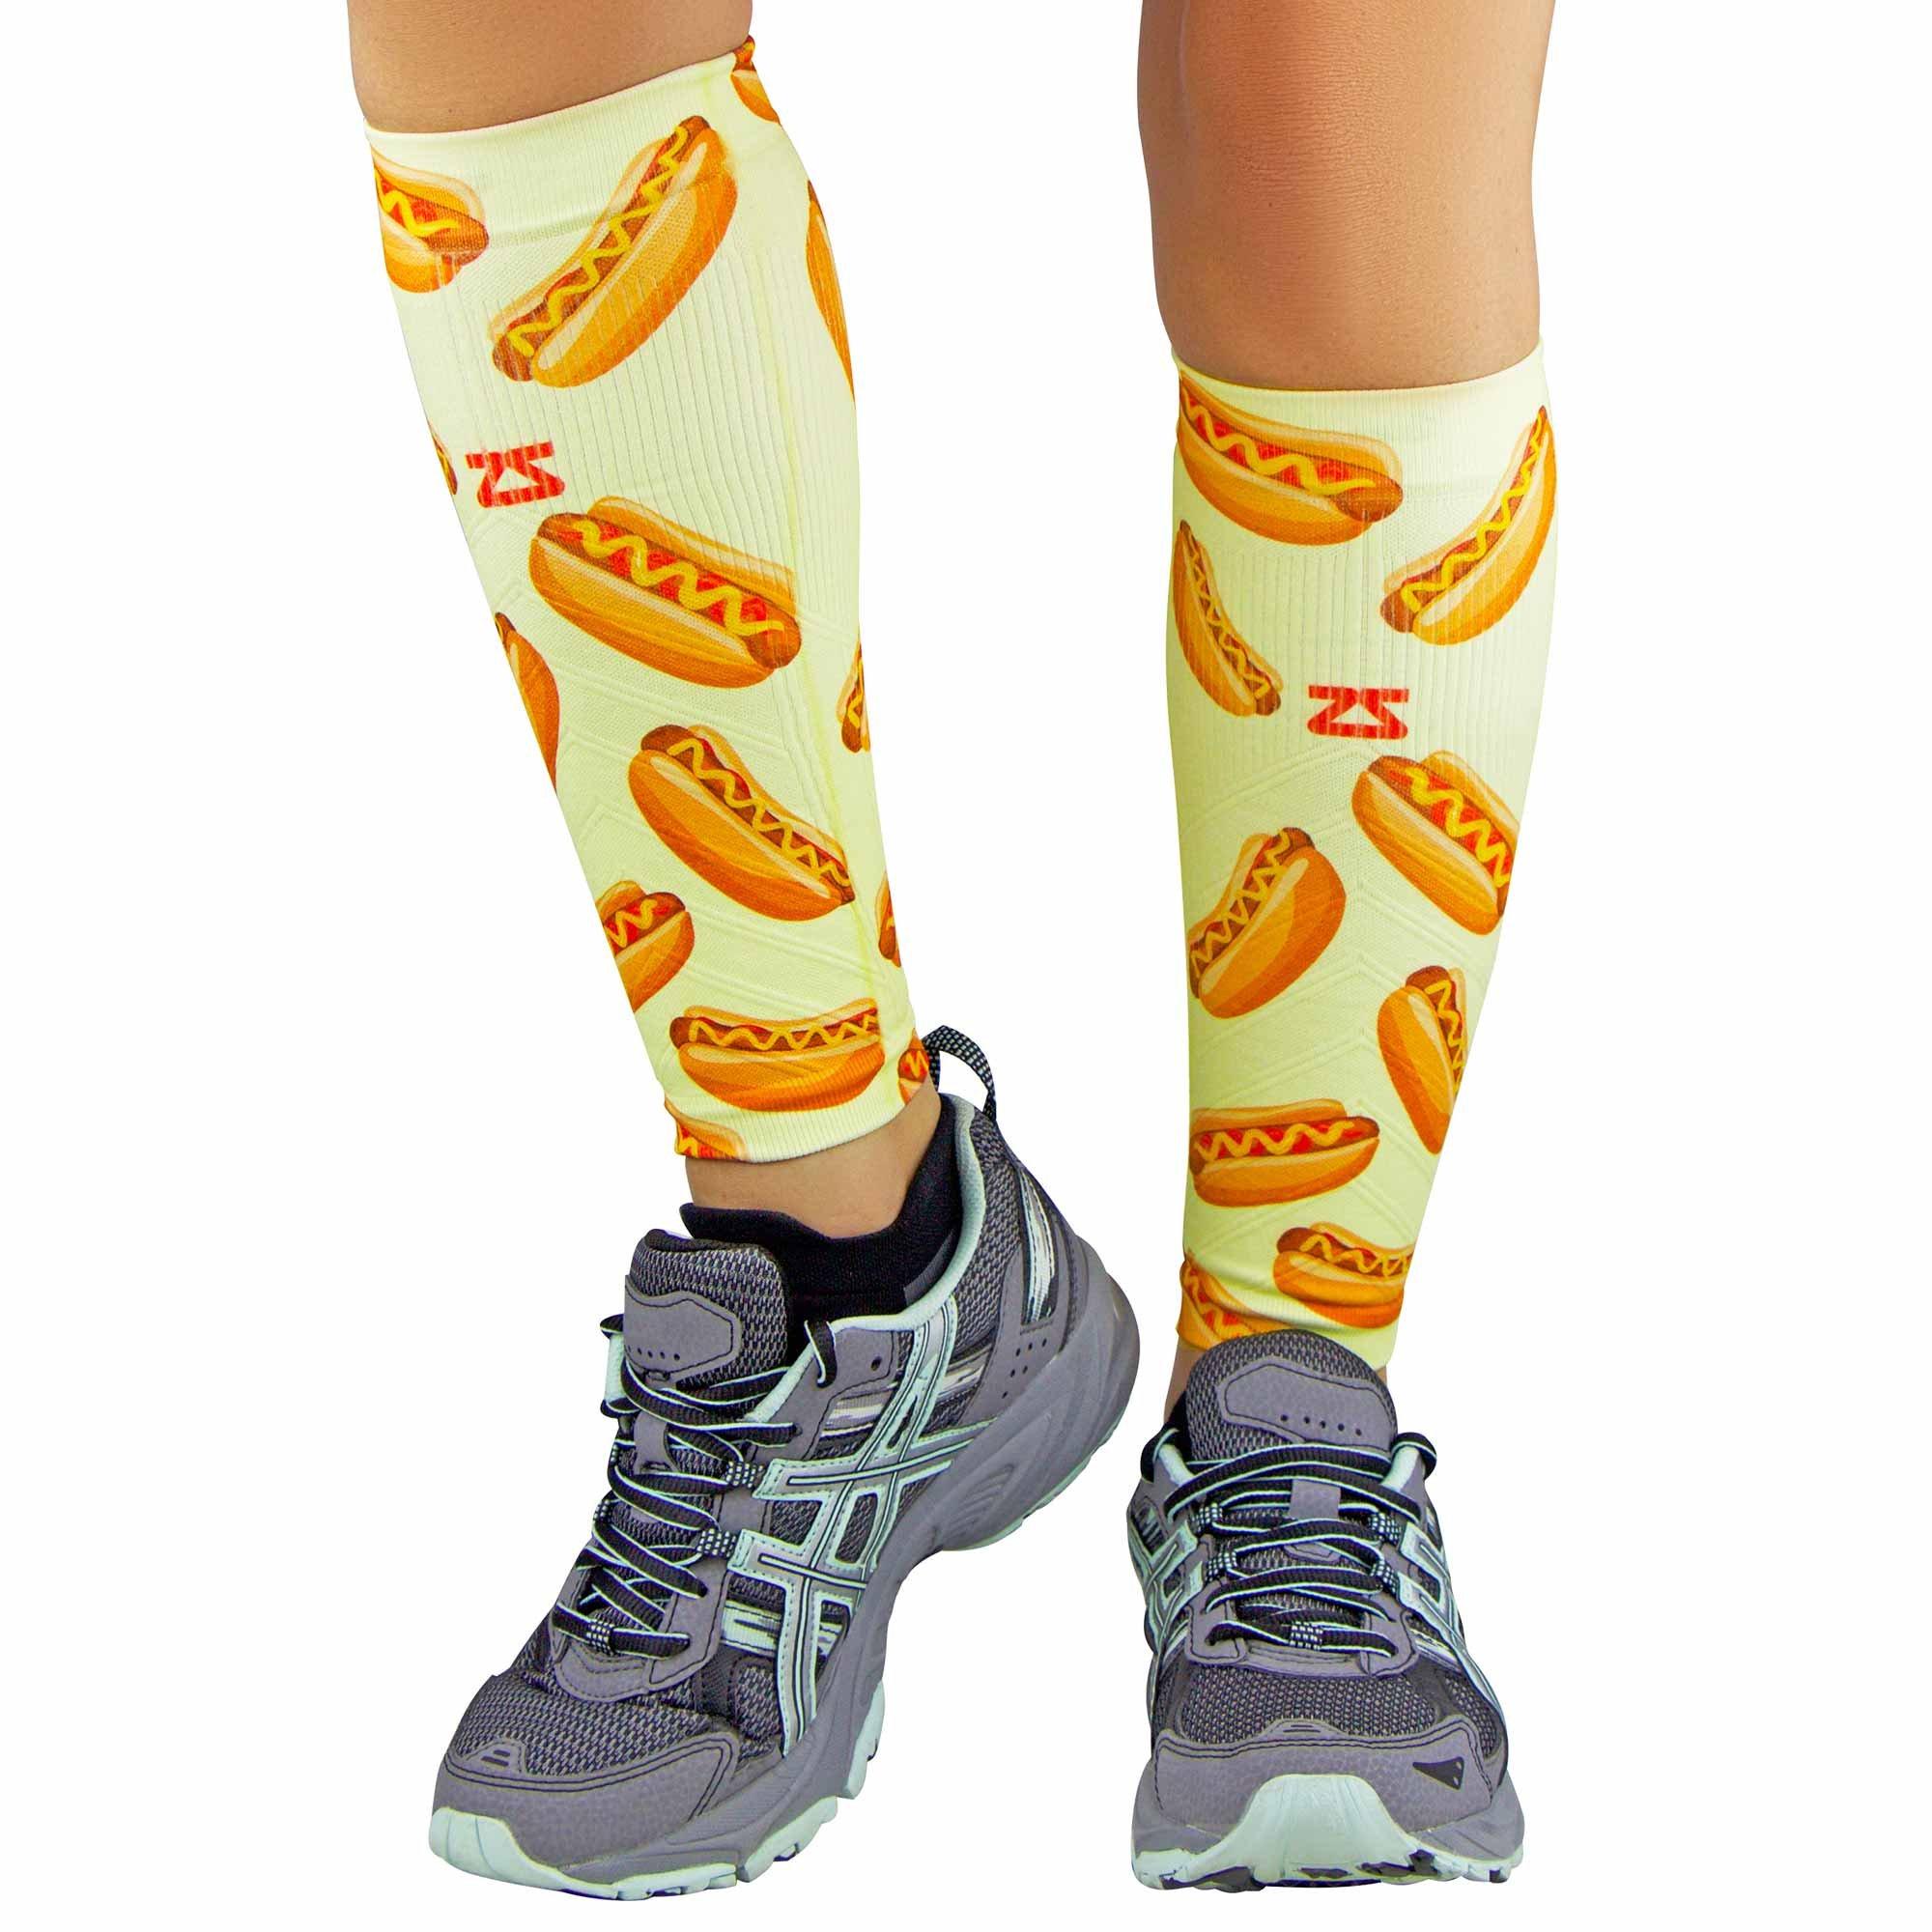 Zensah Print Compression Leg Sleeves - Hot Dogs // Mustard Yellow - L/XL by Zensah